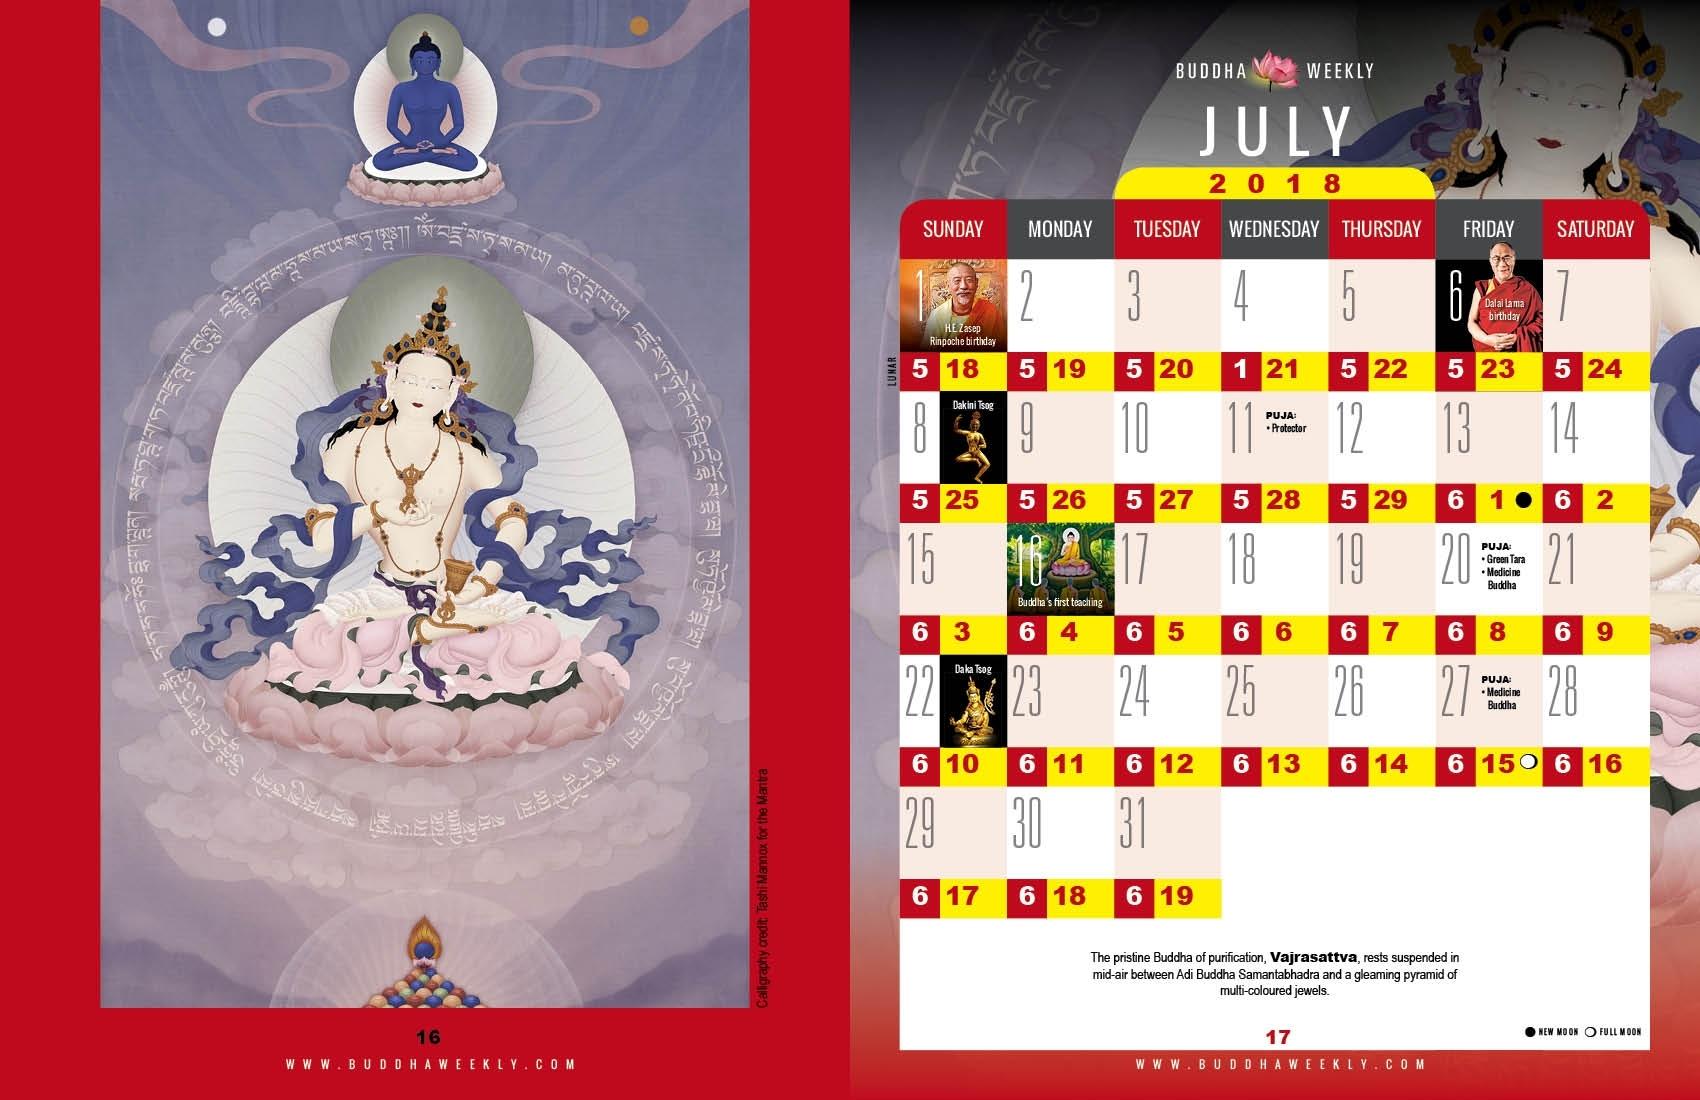 Buddha Weekly's Beautifully Illustrated 2018 Practice Calendar